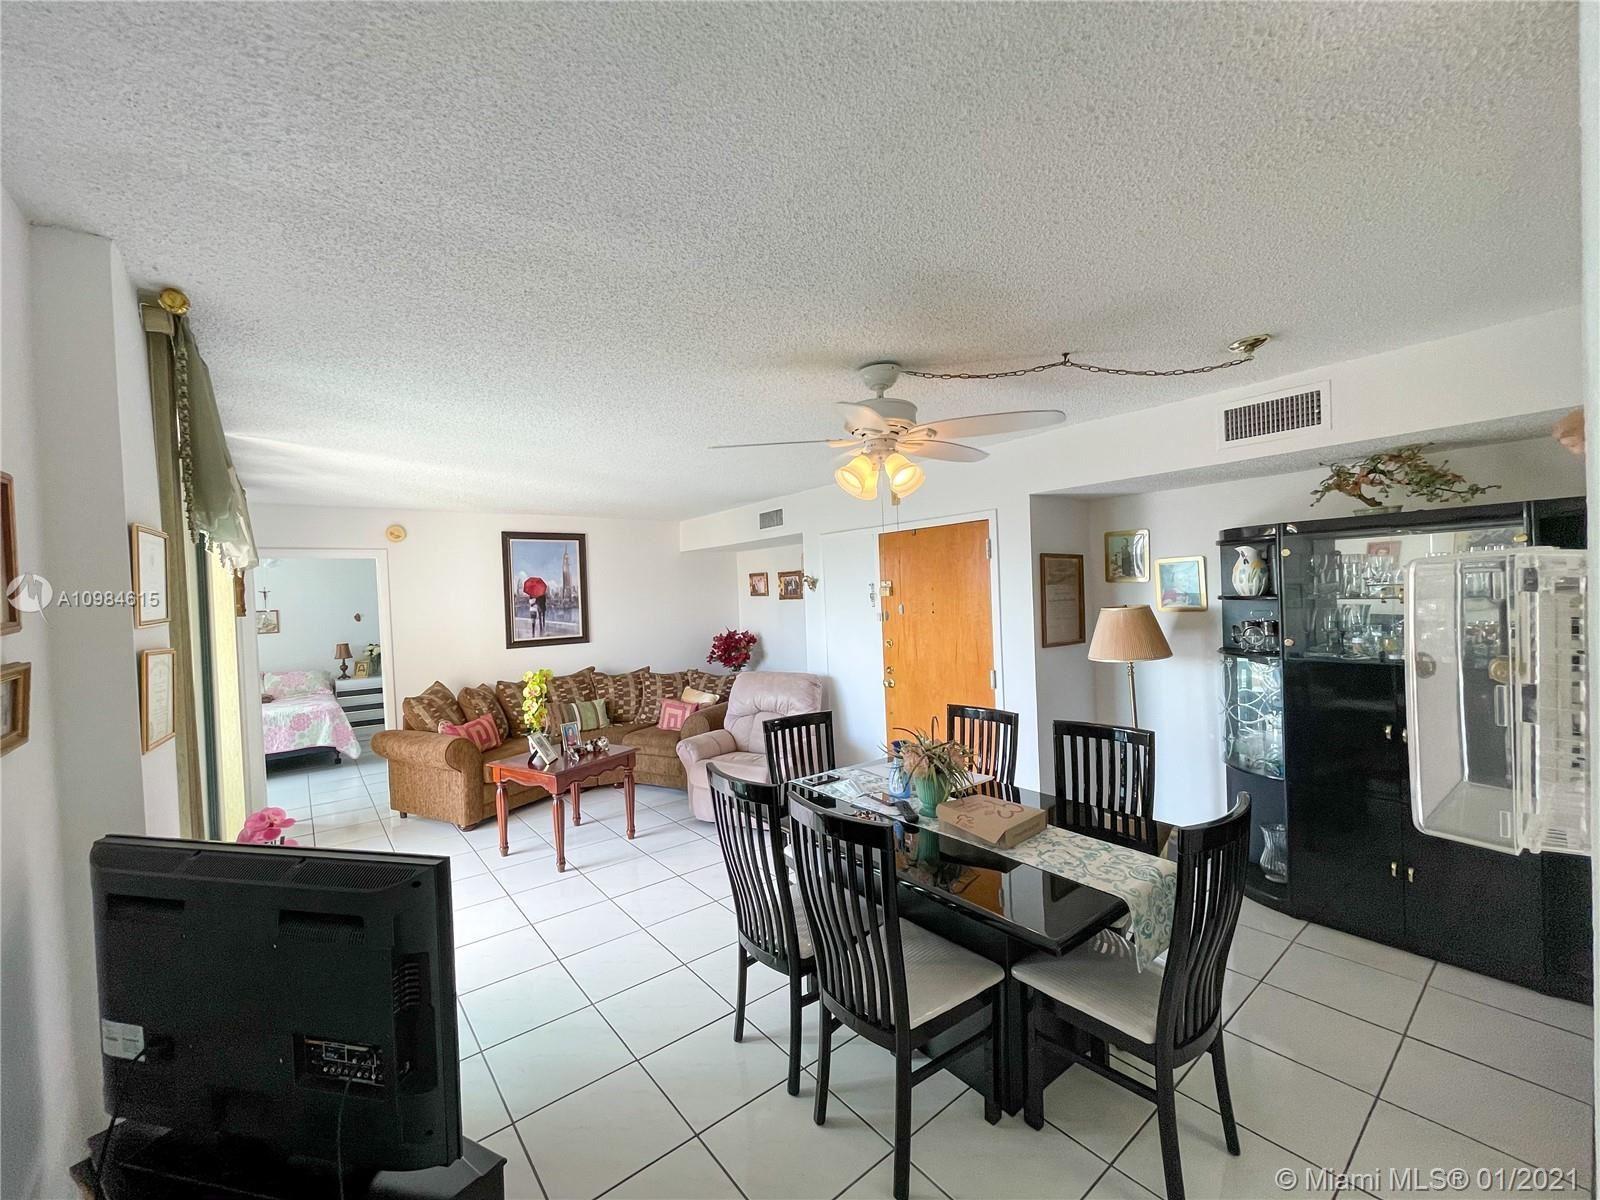 2075 SW 122nd Ave #510, Miami, FL 33175 - #: A10984615